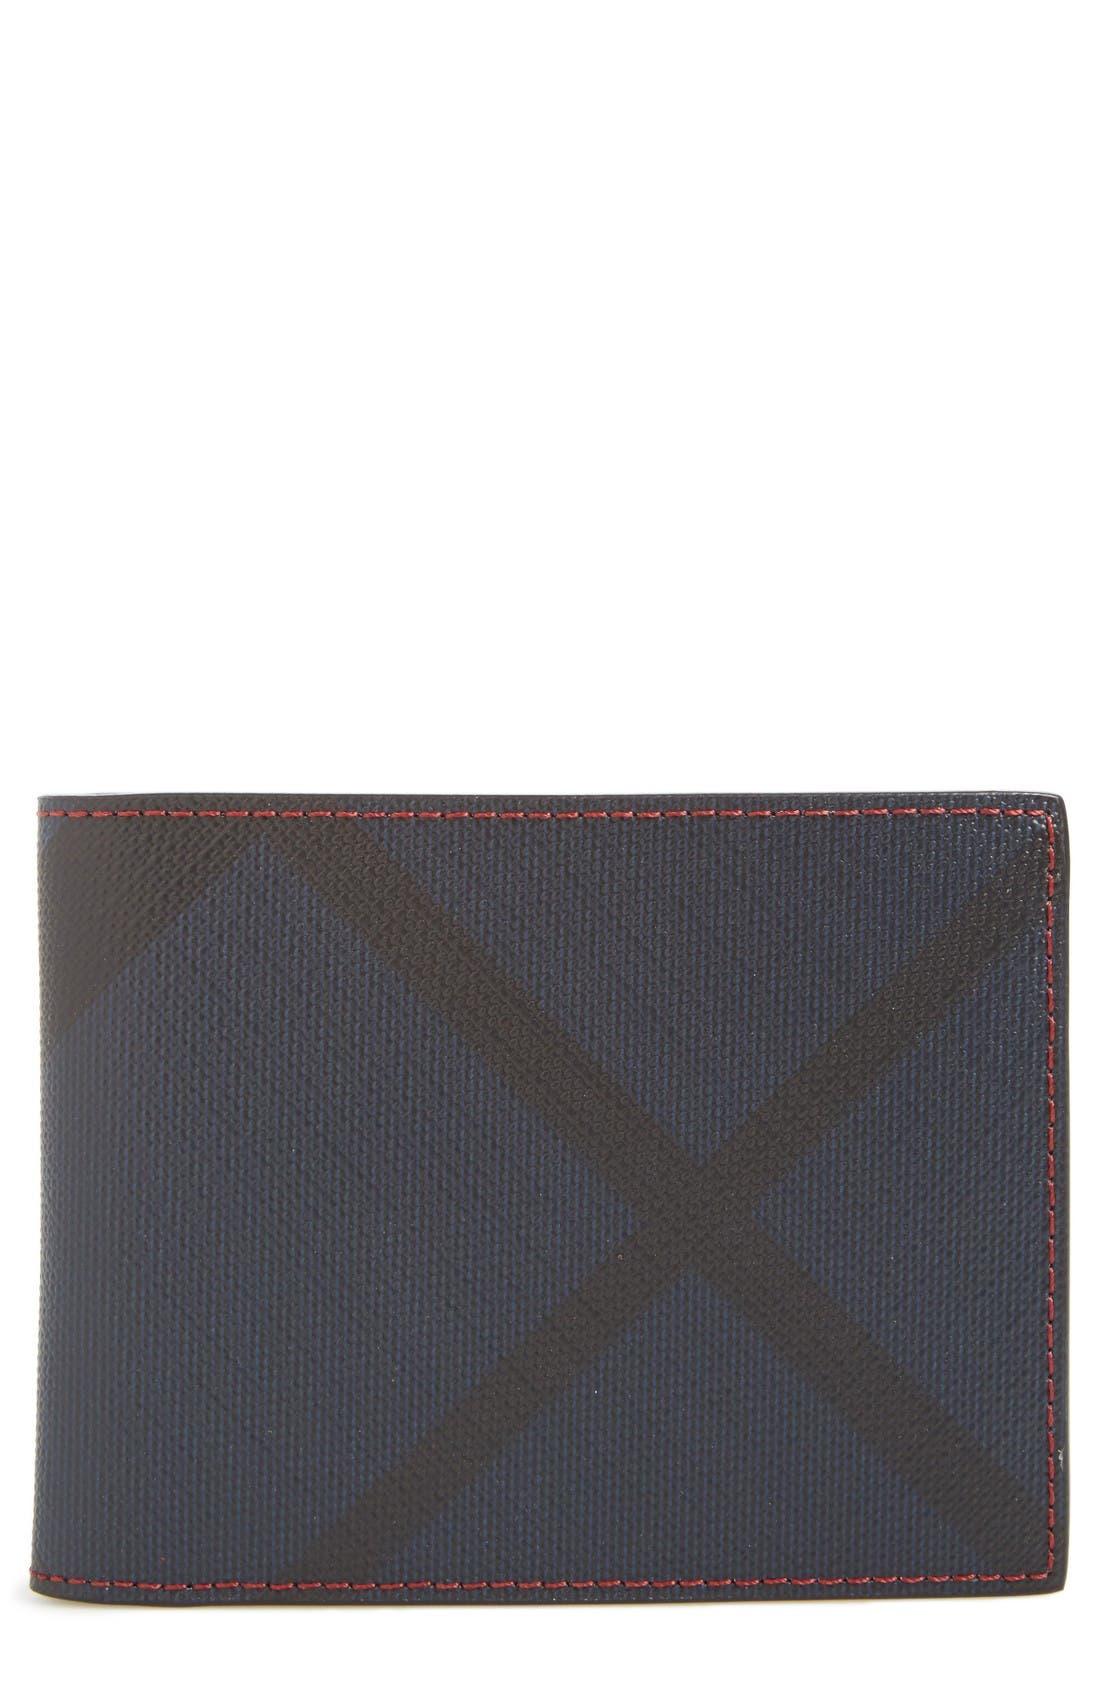 Alternate Image 1 Selected - Burberry Sandon Wallet